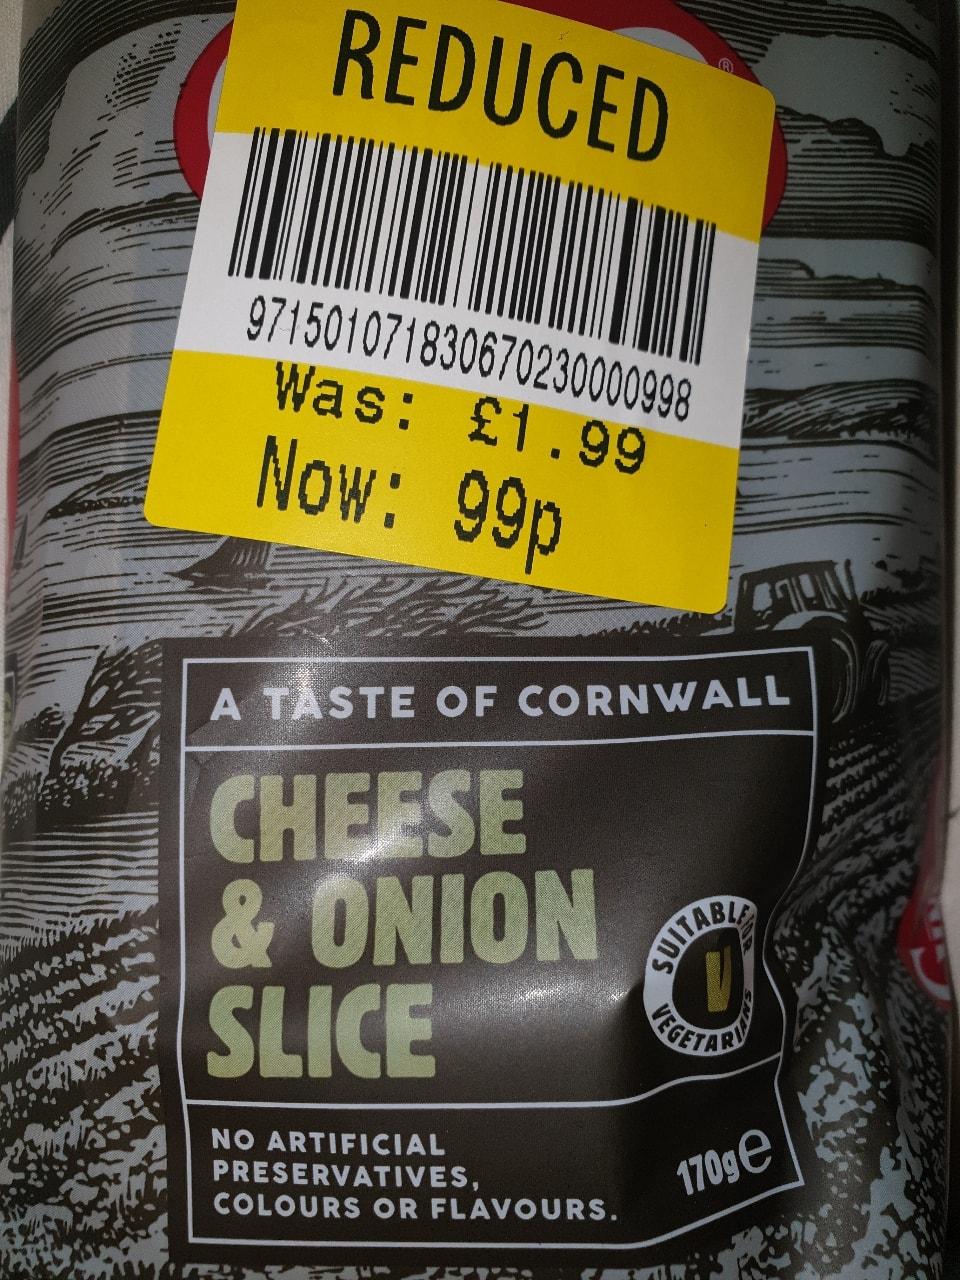 Cheese onion slice